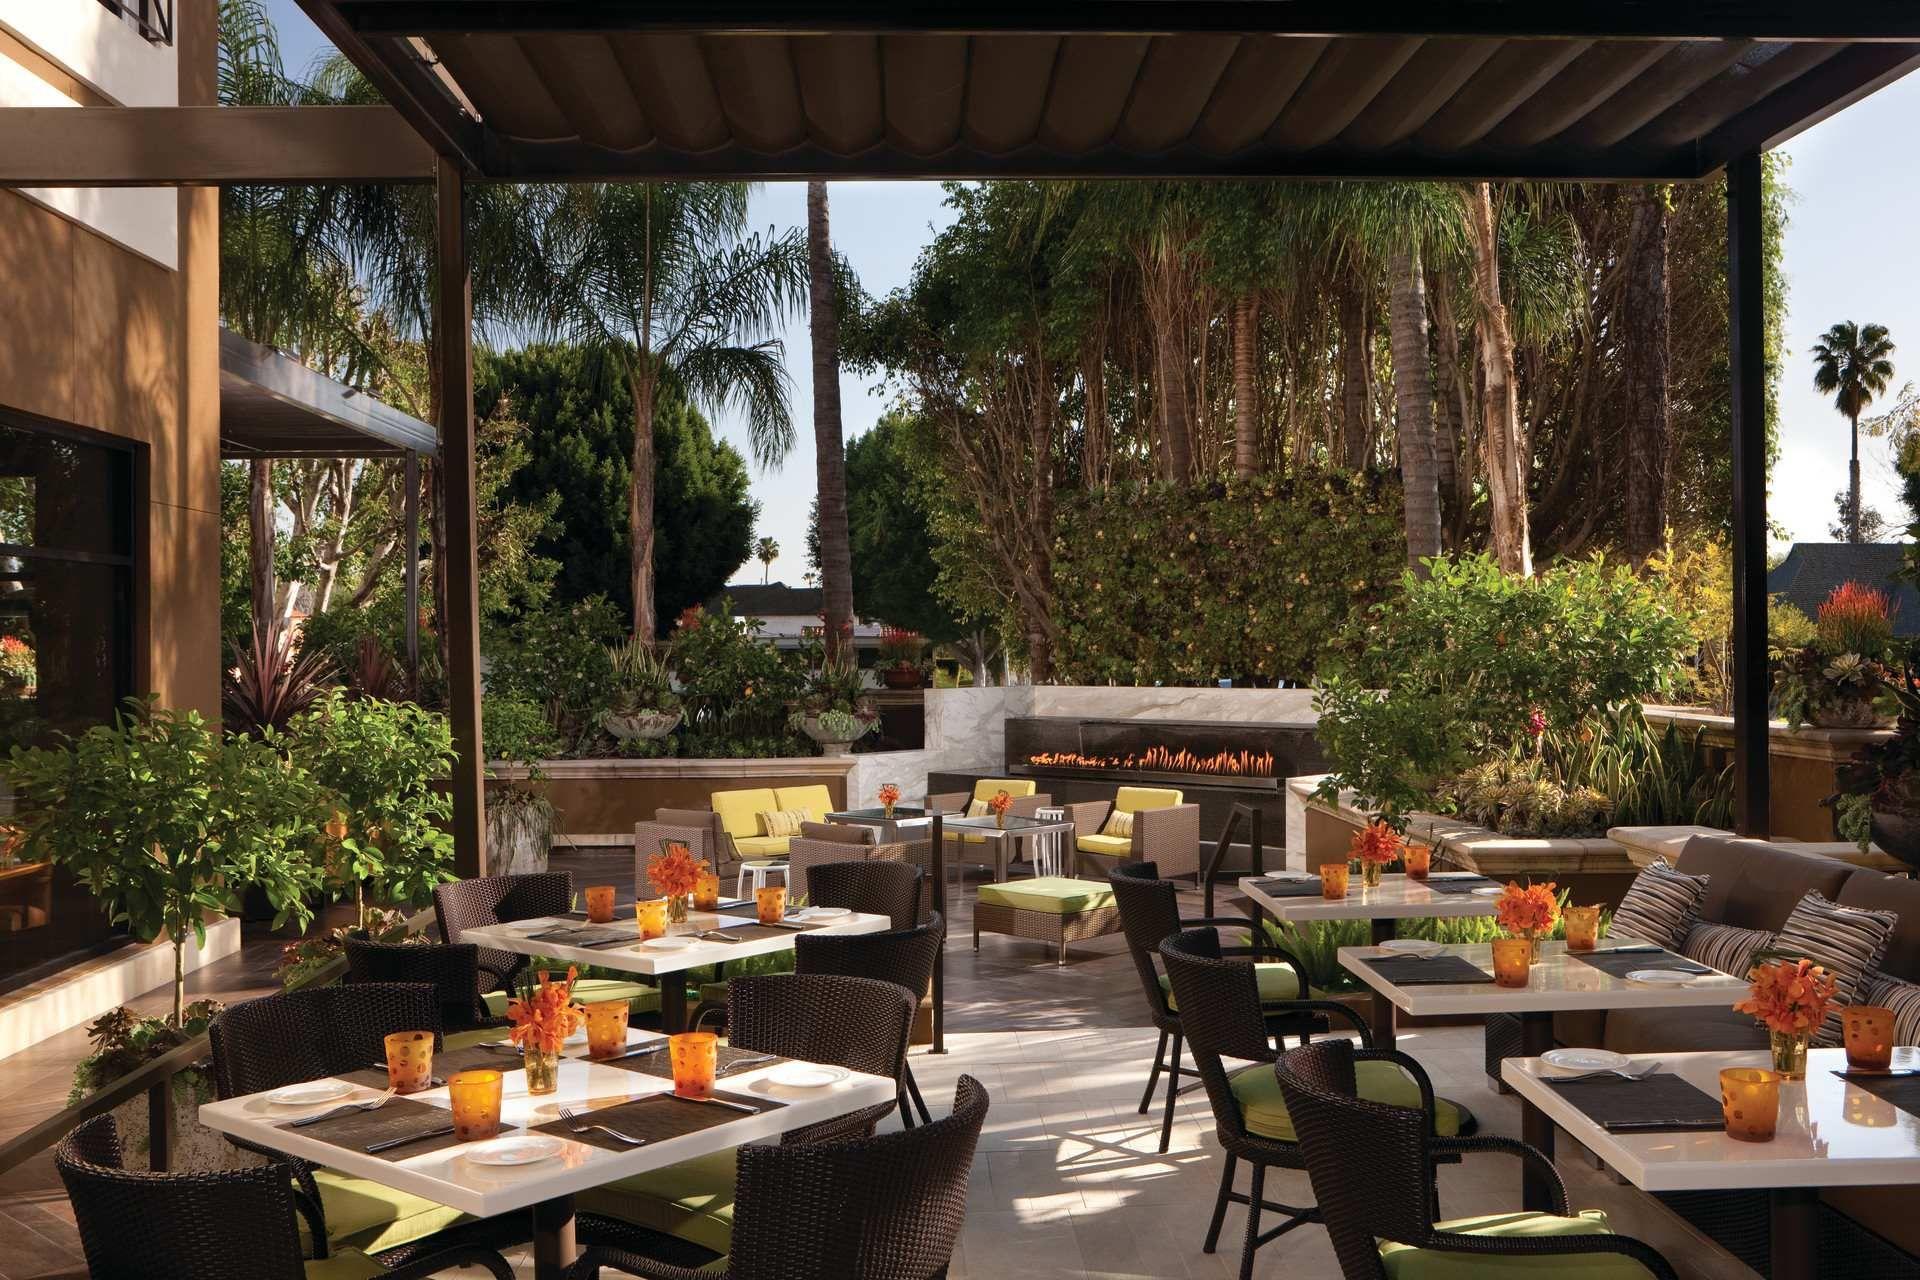 Four Seasons Big Restaurant Gamble Pays Off